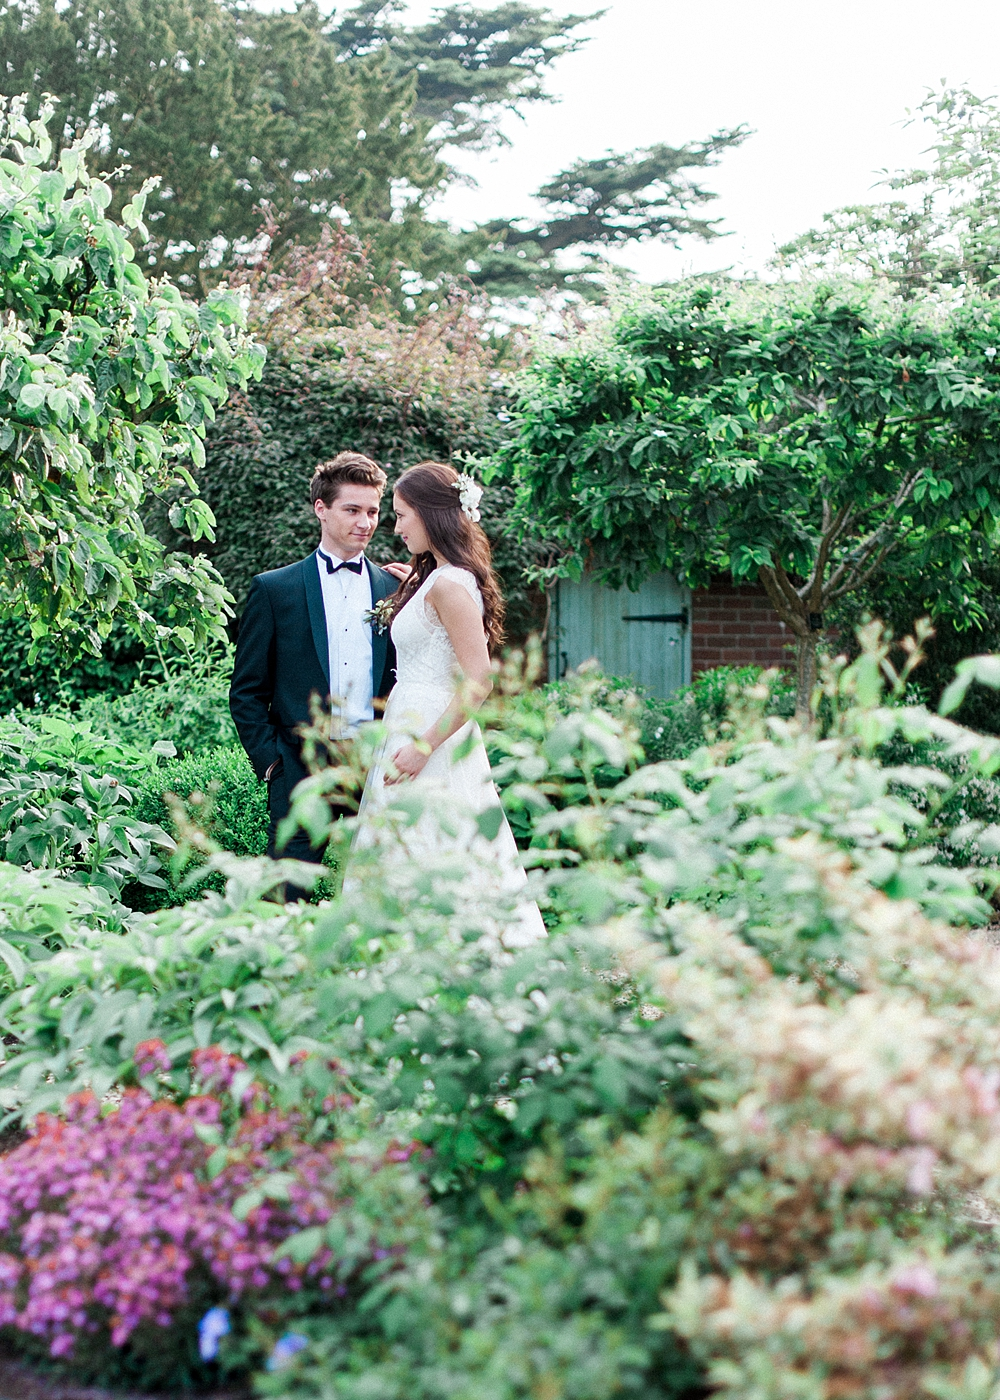 Wickham House Elopement -Kate Nielen Photography -